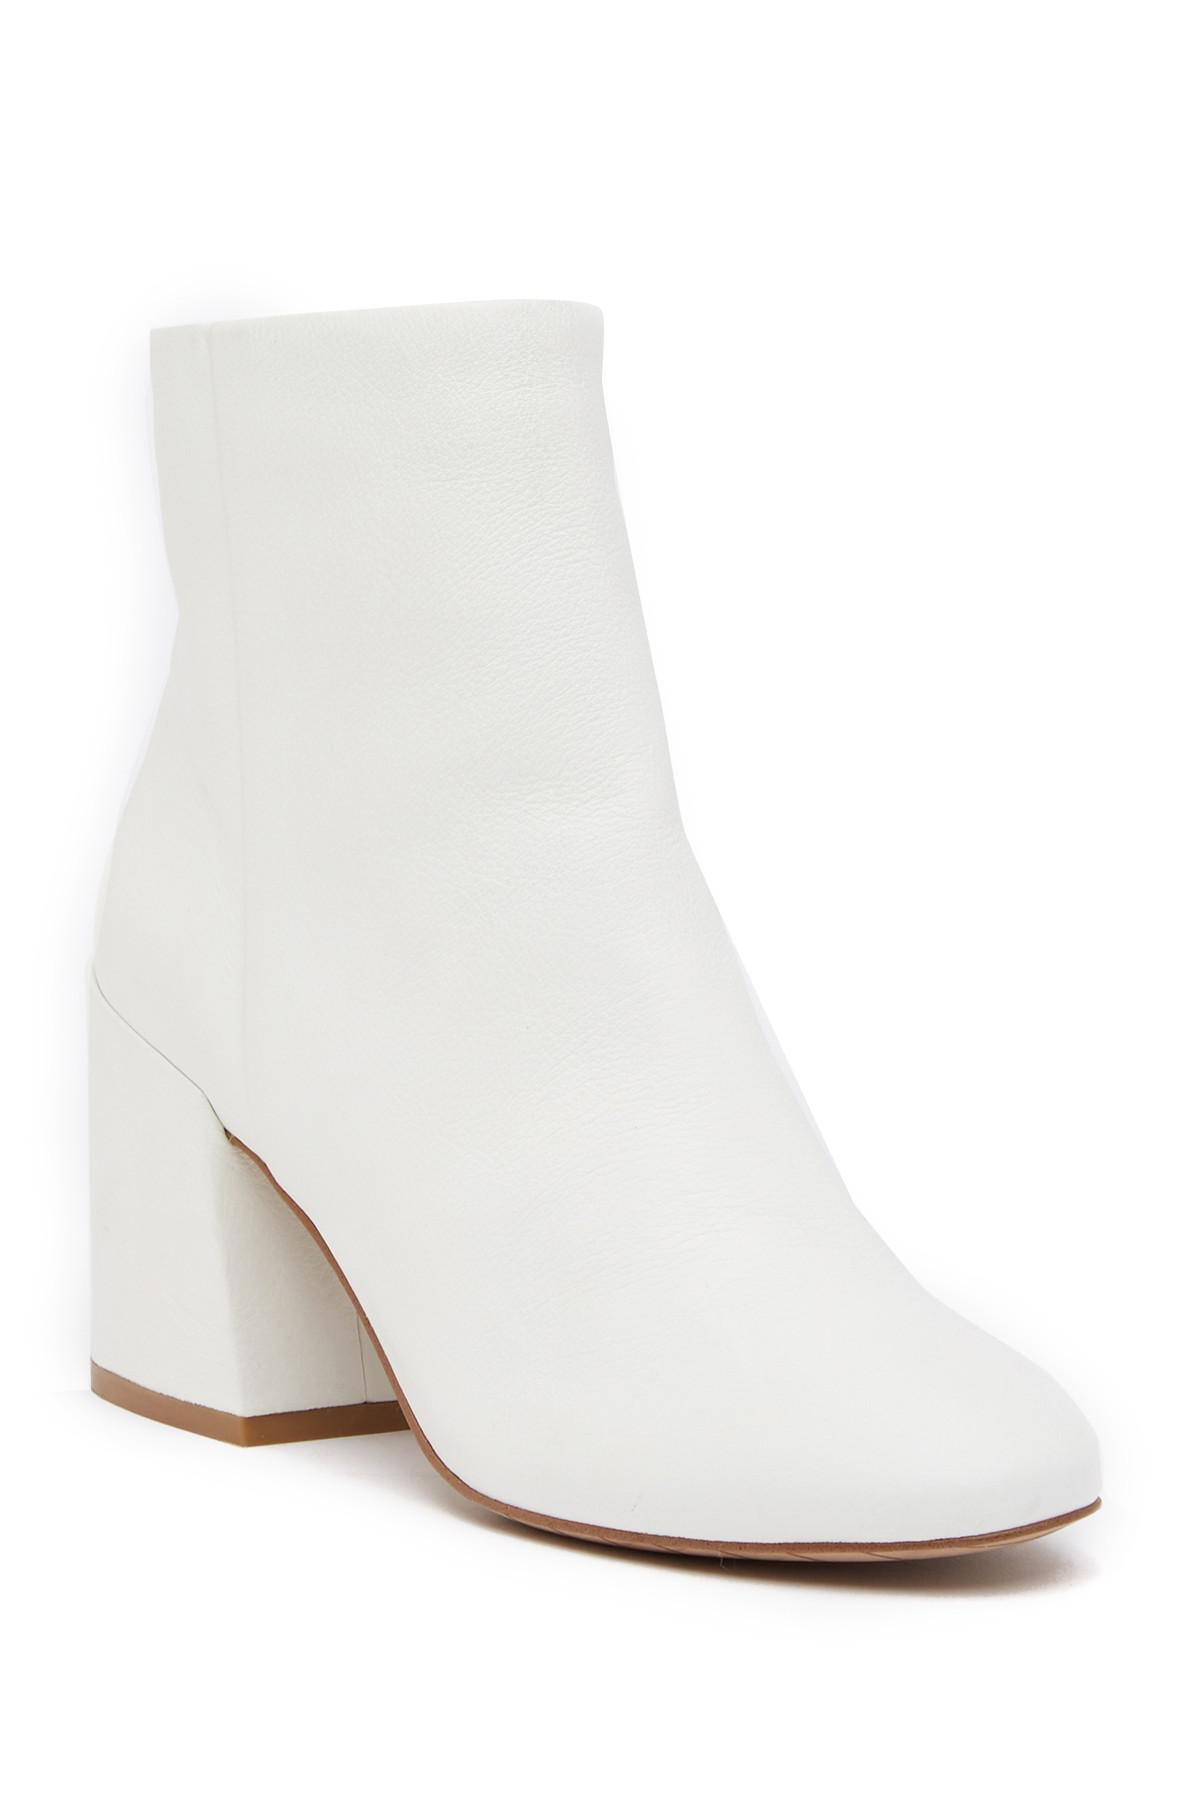 Purchase Kenneth Cole New York Randii Bootie(Women's) -Black Glitter Aberdeen Cheap Ebay With Paypal Online l5oQ5EDOj